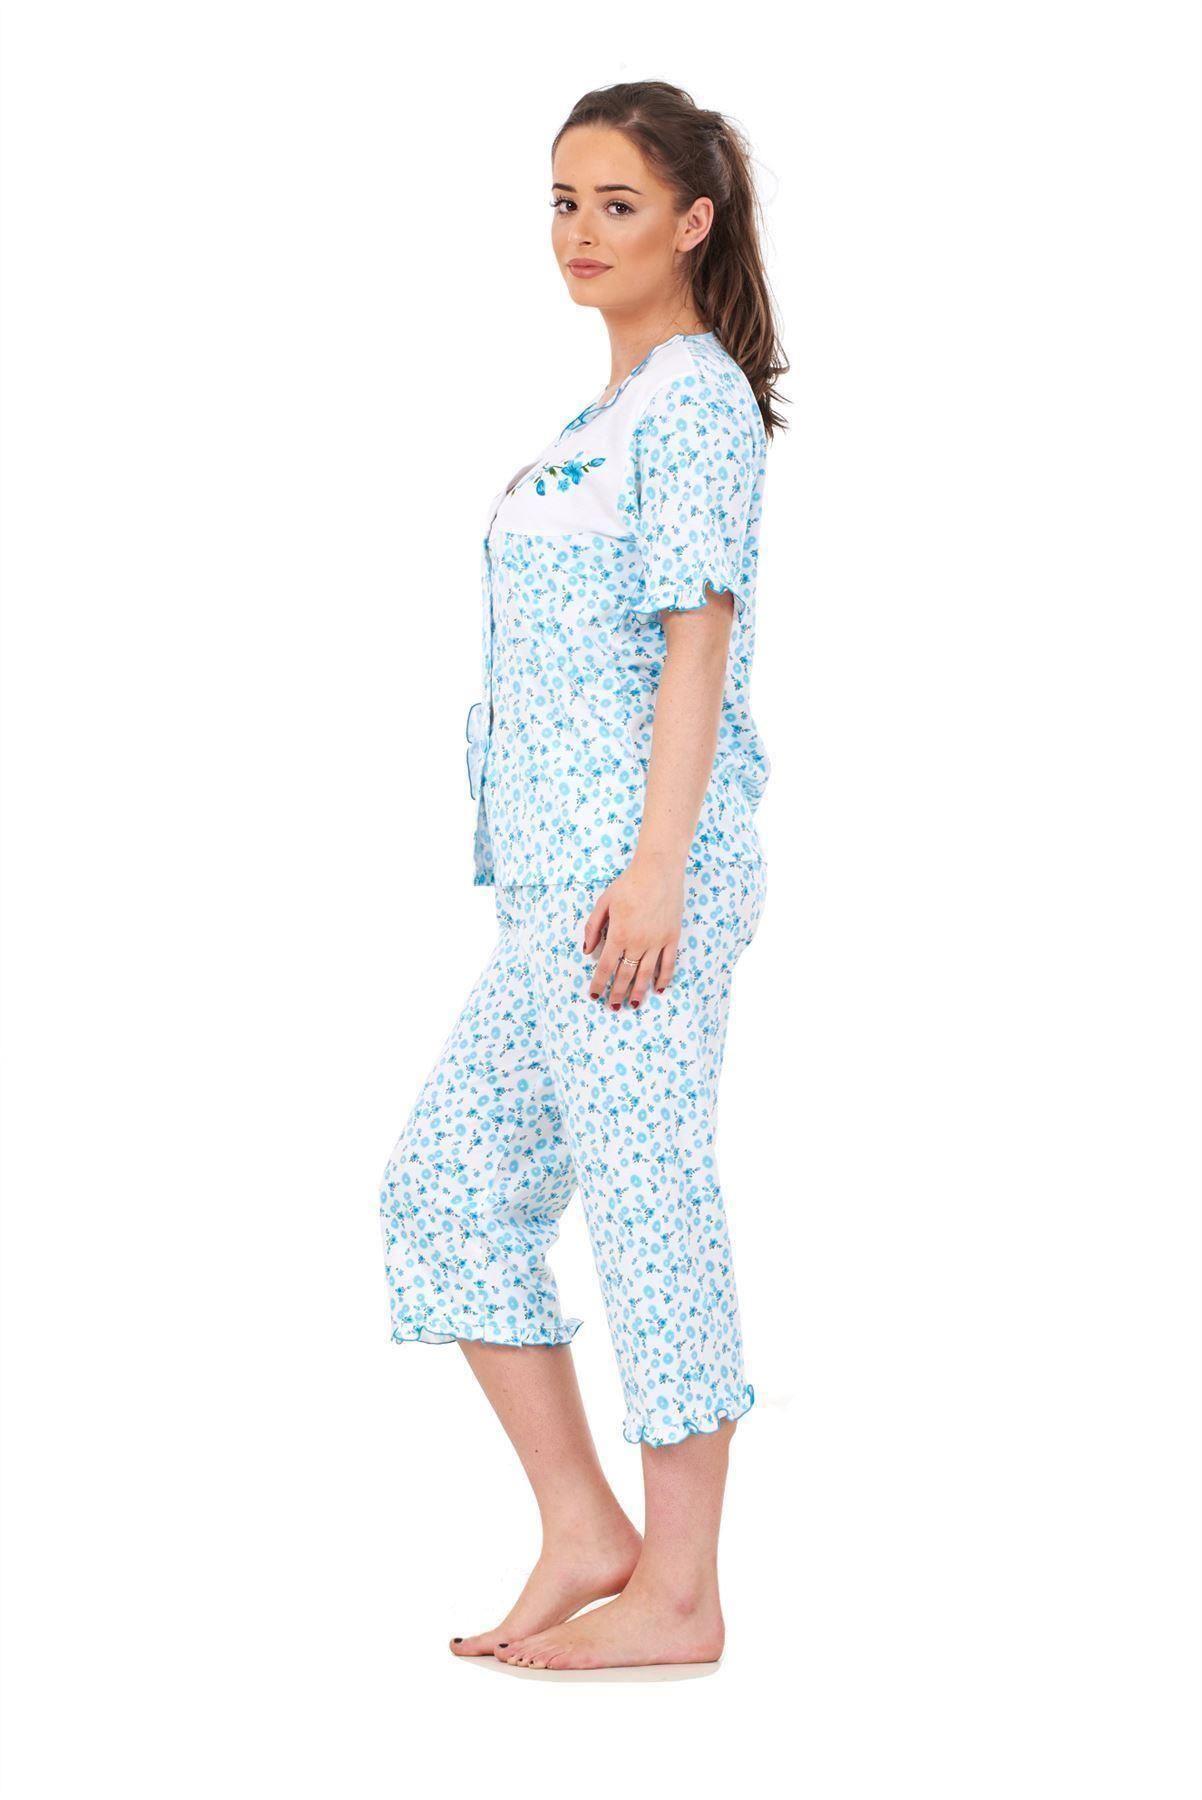 Donna Pigiama Set 3//4 lunghezza manica corta cotone tasca morbida Nightwear M a XXL